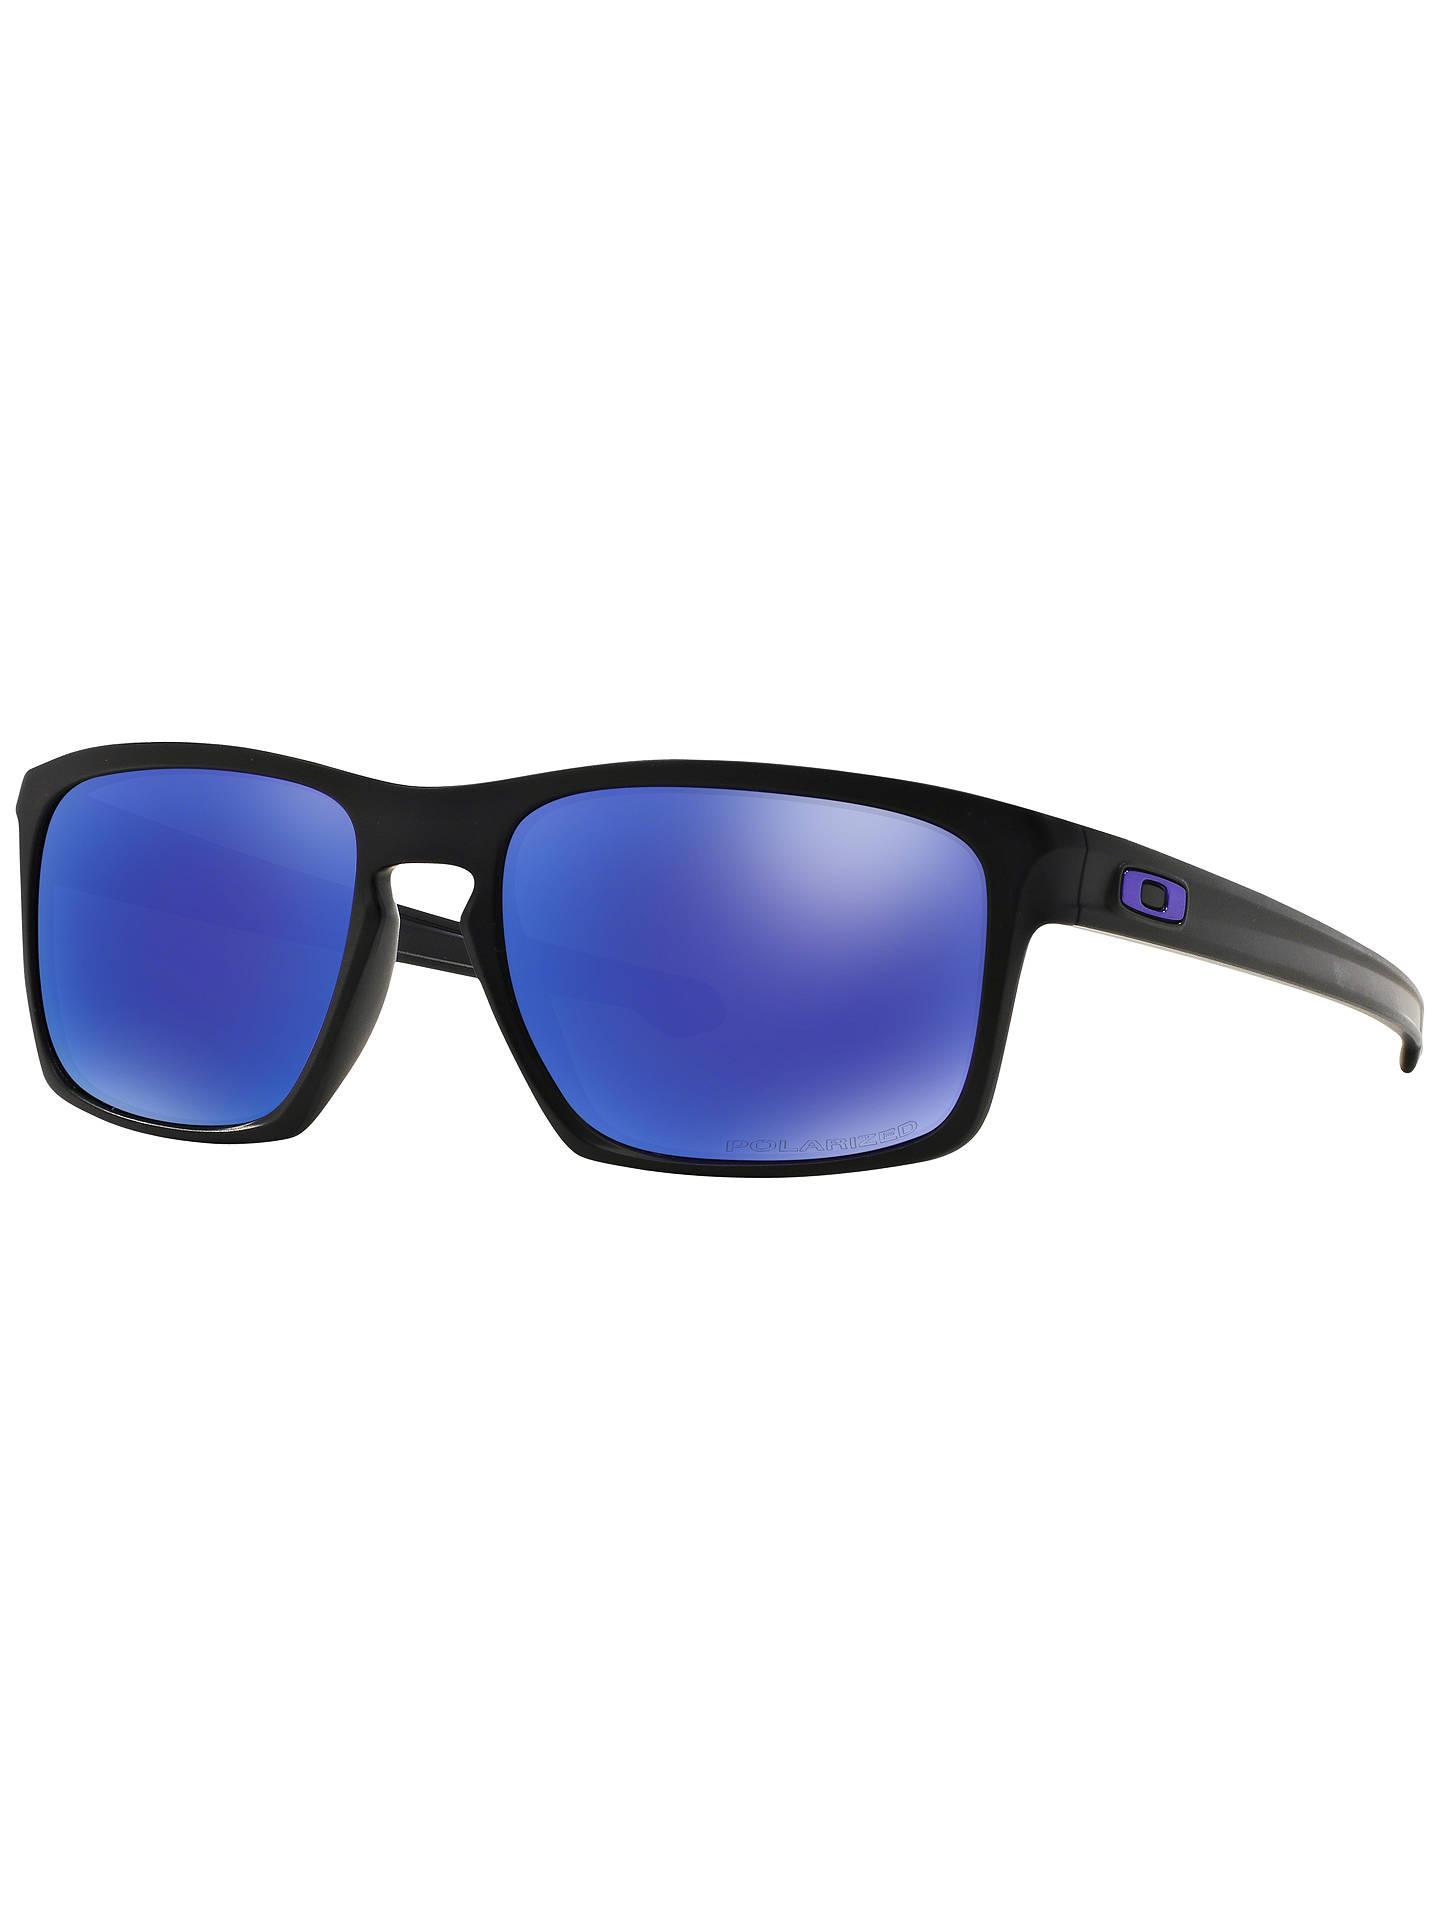 84bc0ae6e83 Oakley OO9262 Sliver Polarised Sunglasses at John Lewis   Partners